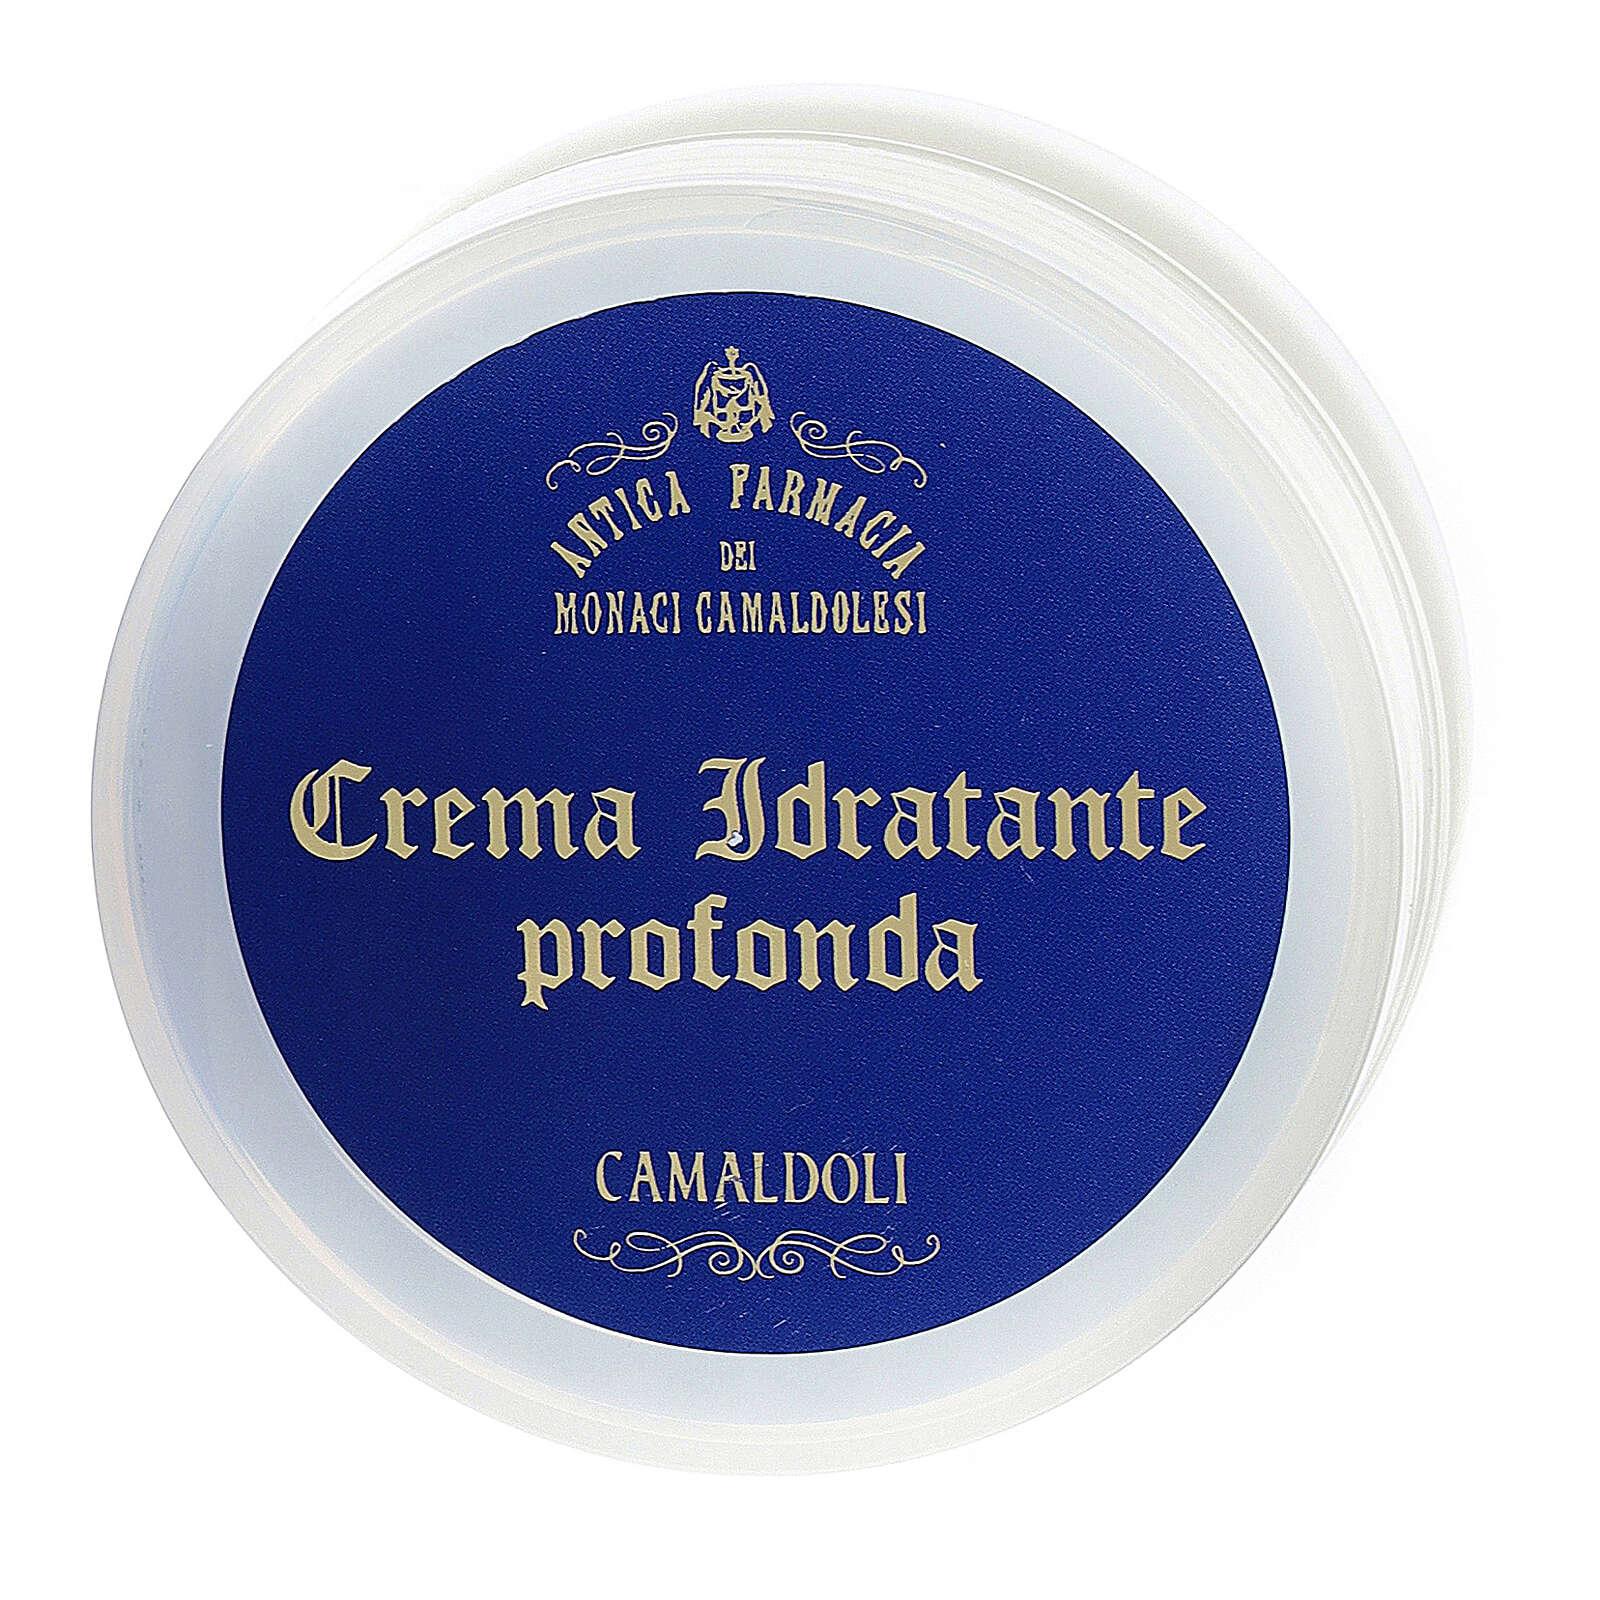 Crème hydratation profonde naturelle 50 ml Camaldoli 4